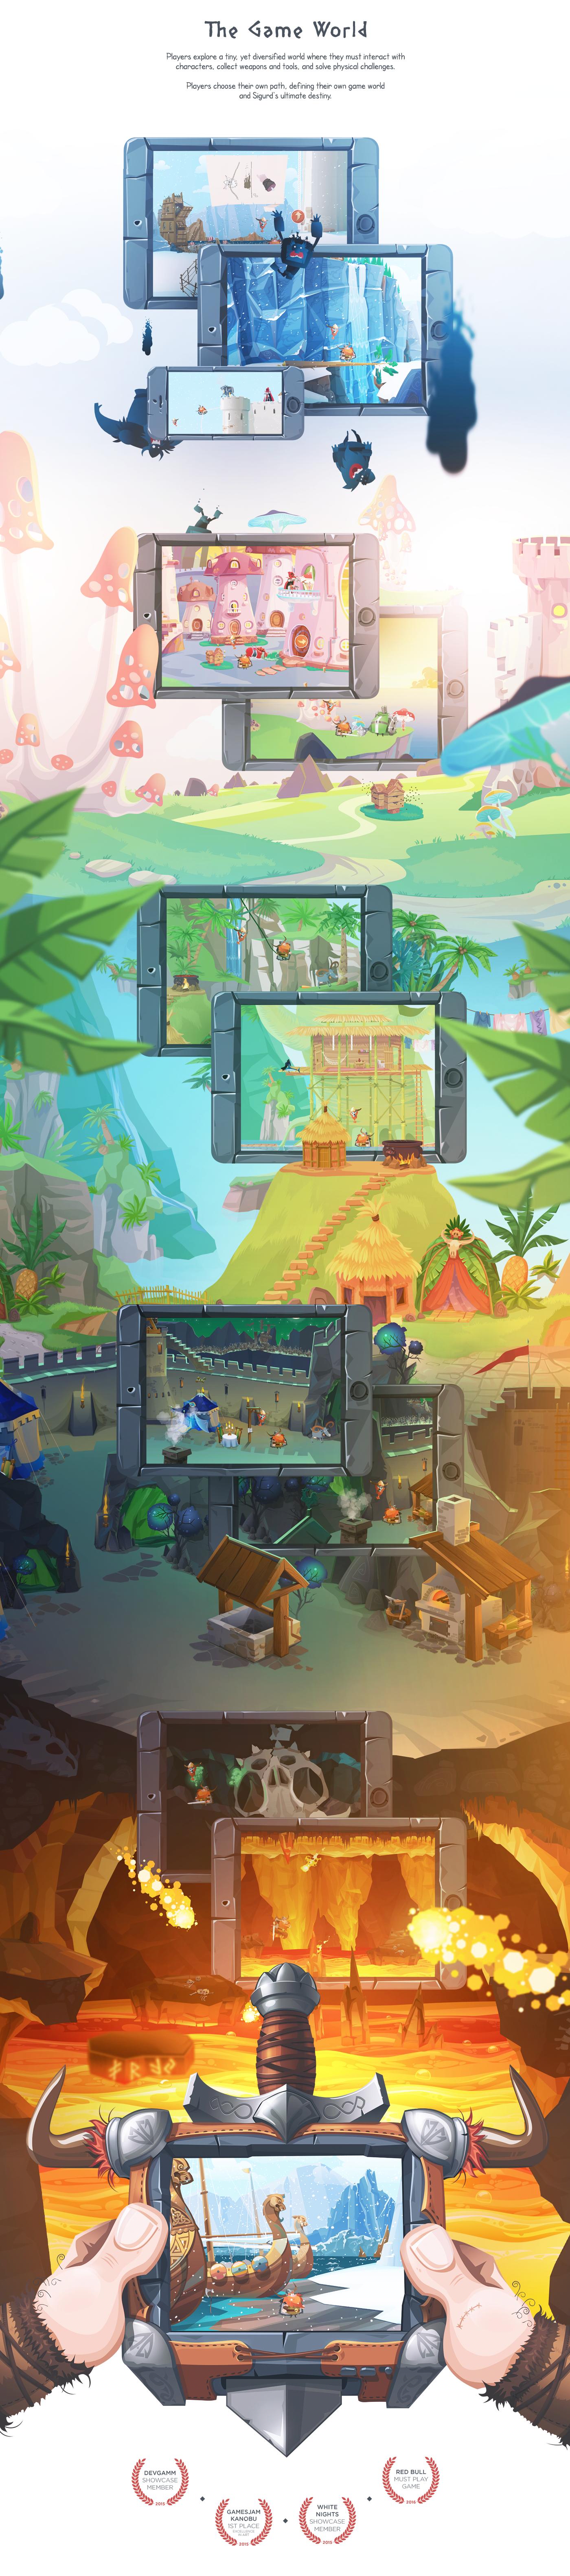 iphone stone game viking iPad valkyrie valhalla adventure quest cartoon